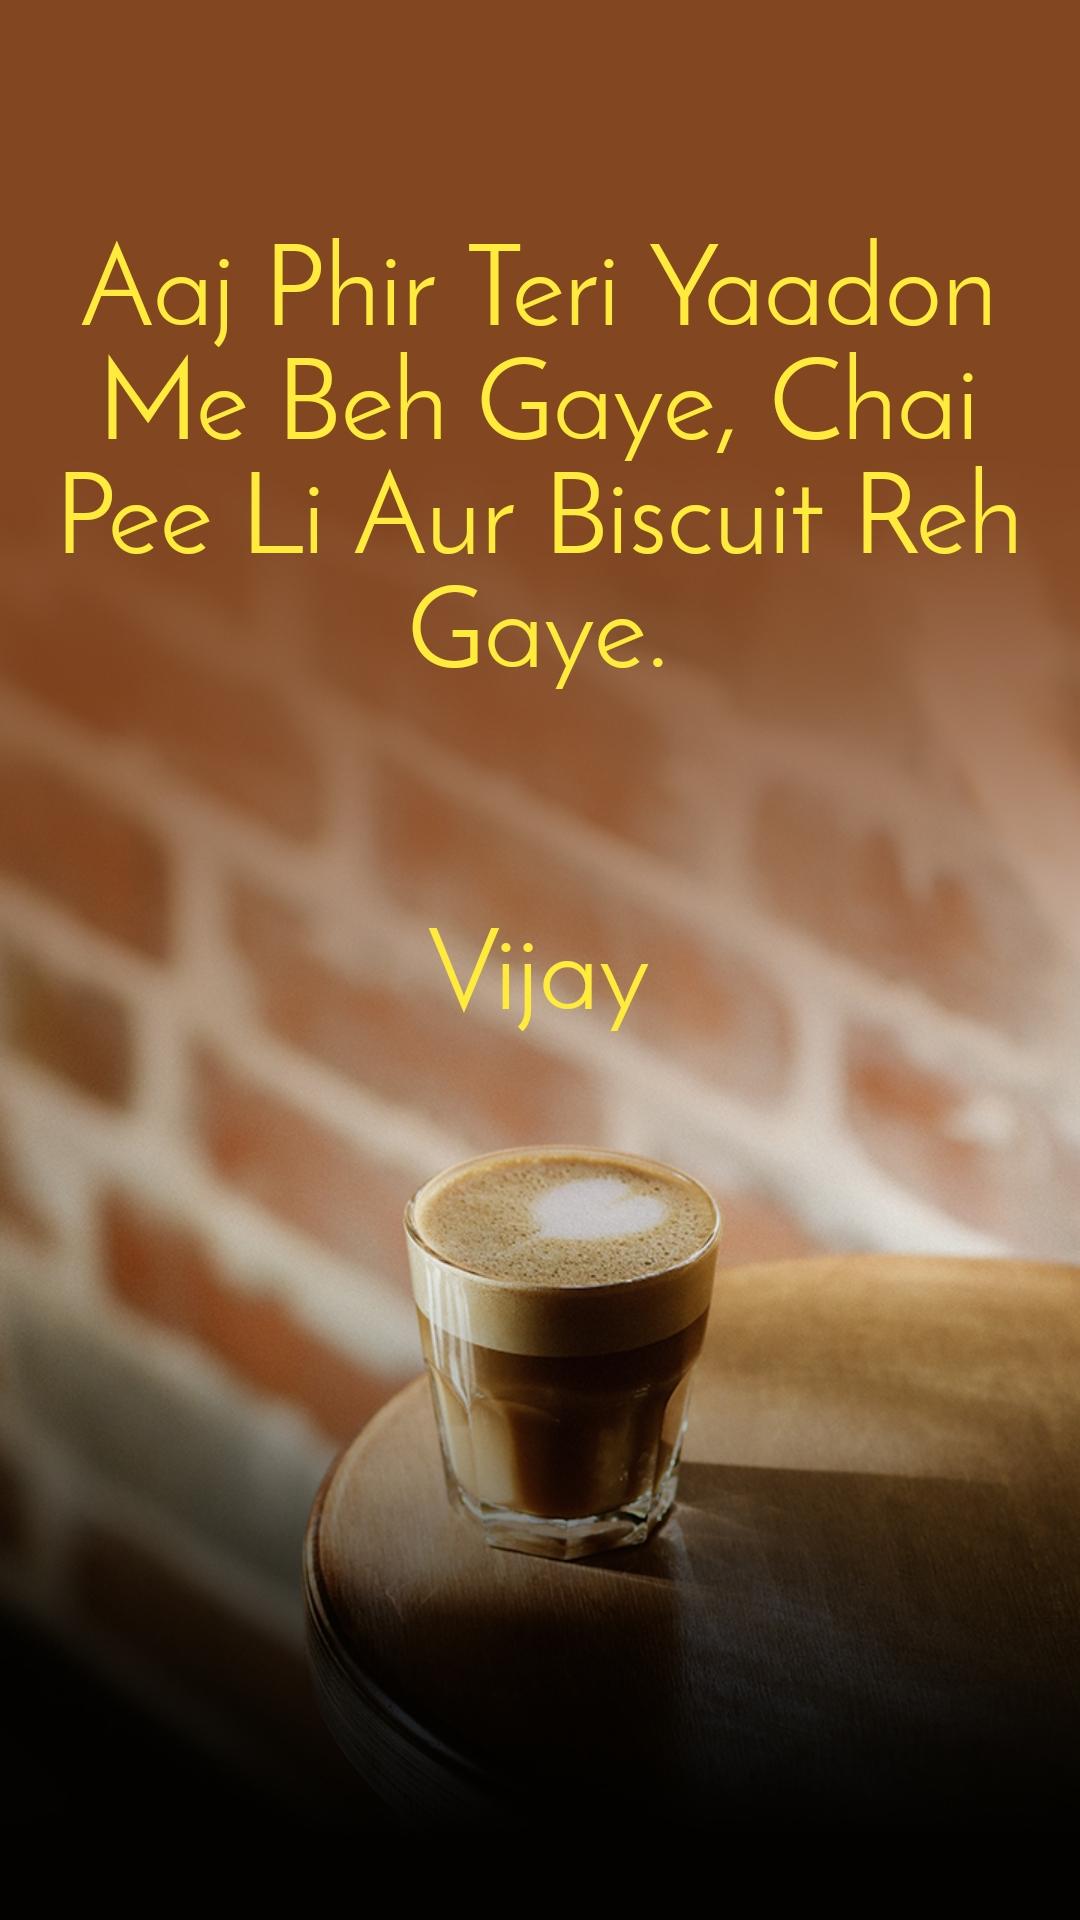 Aaj Phir Teri Yaadon Me Beh Gaye, Chai Pee Li Aur Biscuit Reh Gaye.   Vijay